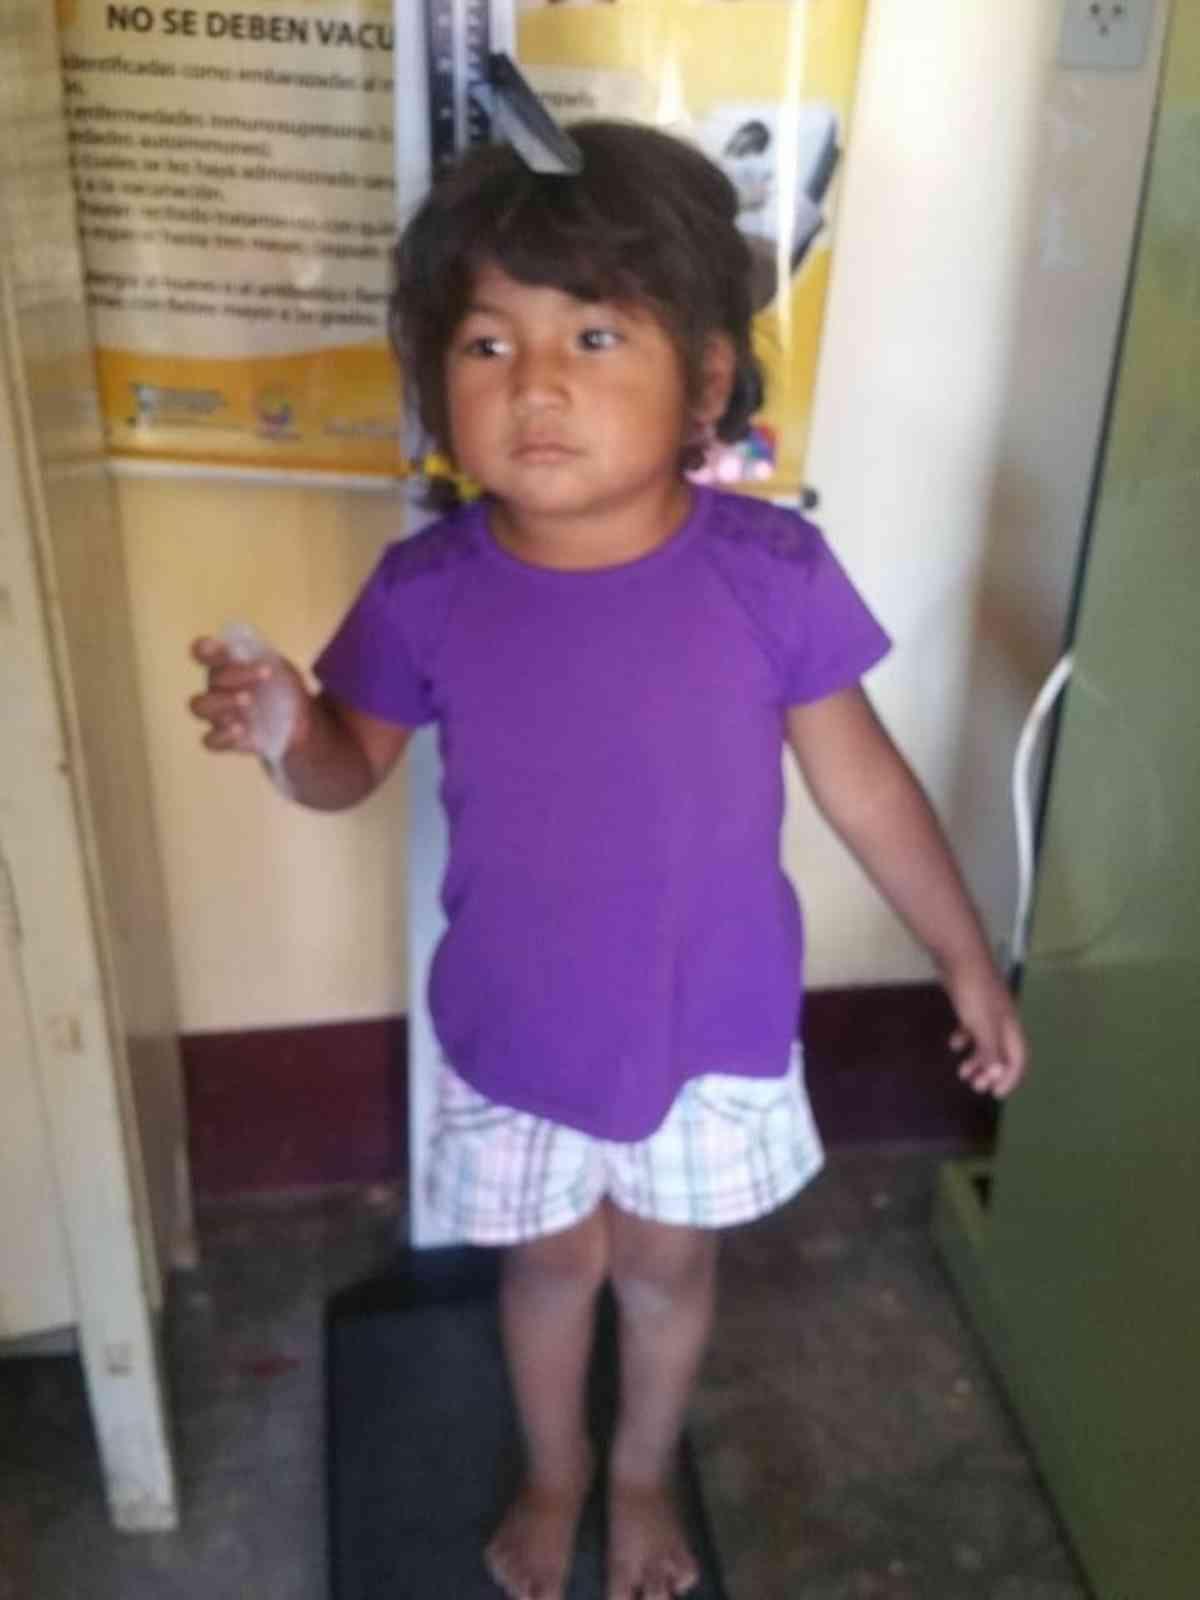 Kampong Tom Child Resized